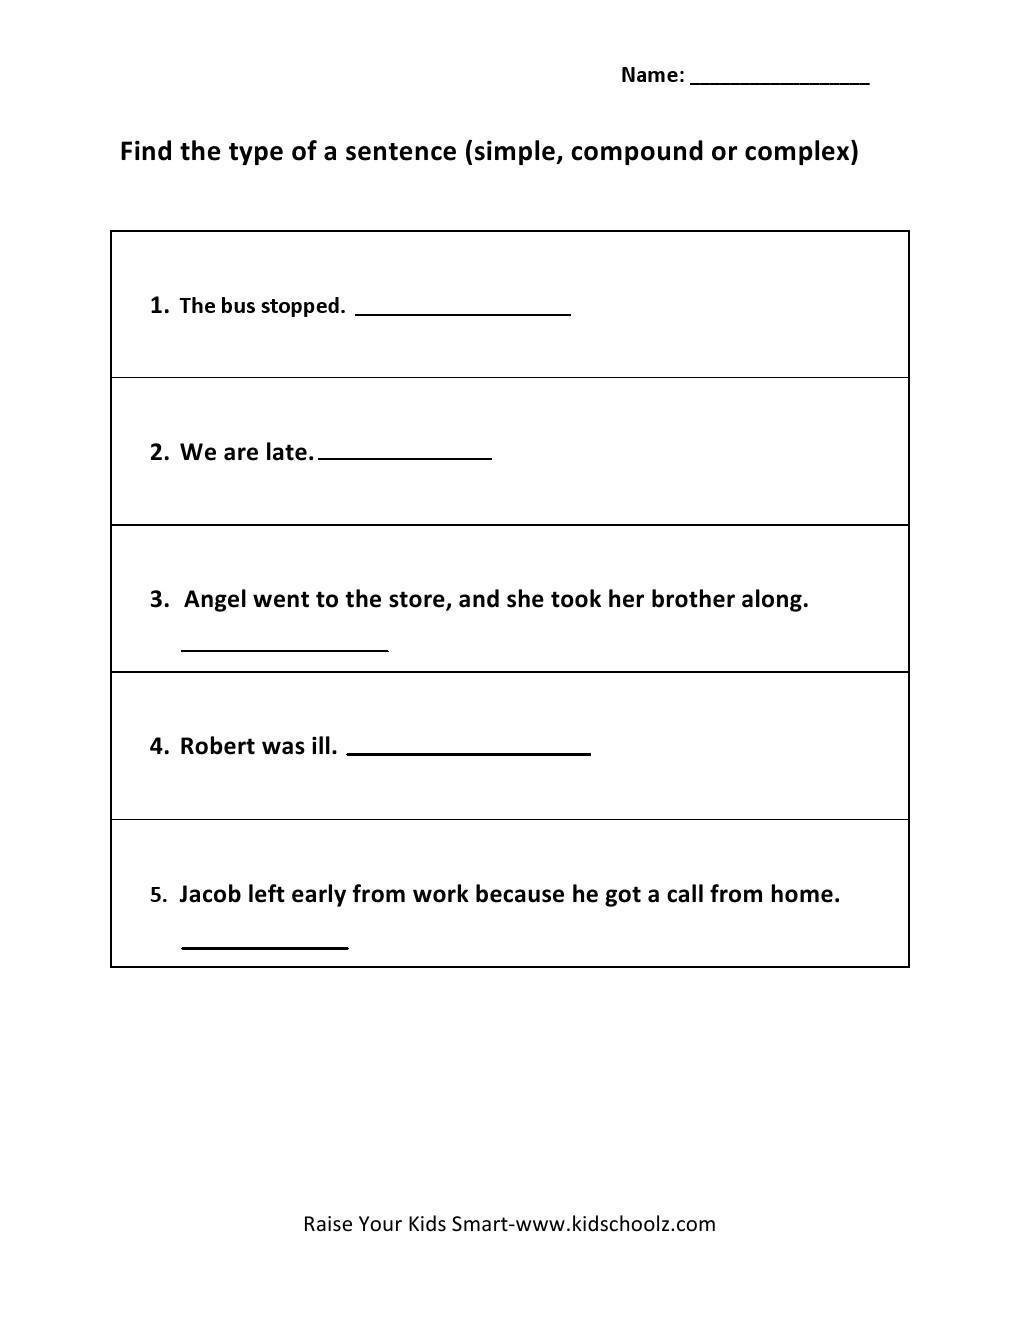 hight resolution of Grade 5 - Types of sentence Worksheets 4 - Kidschoolz